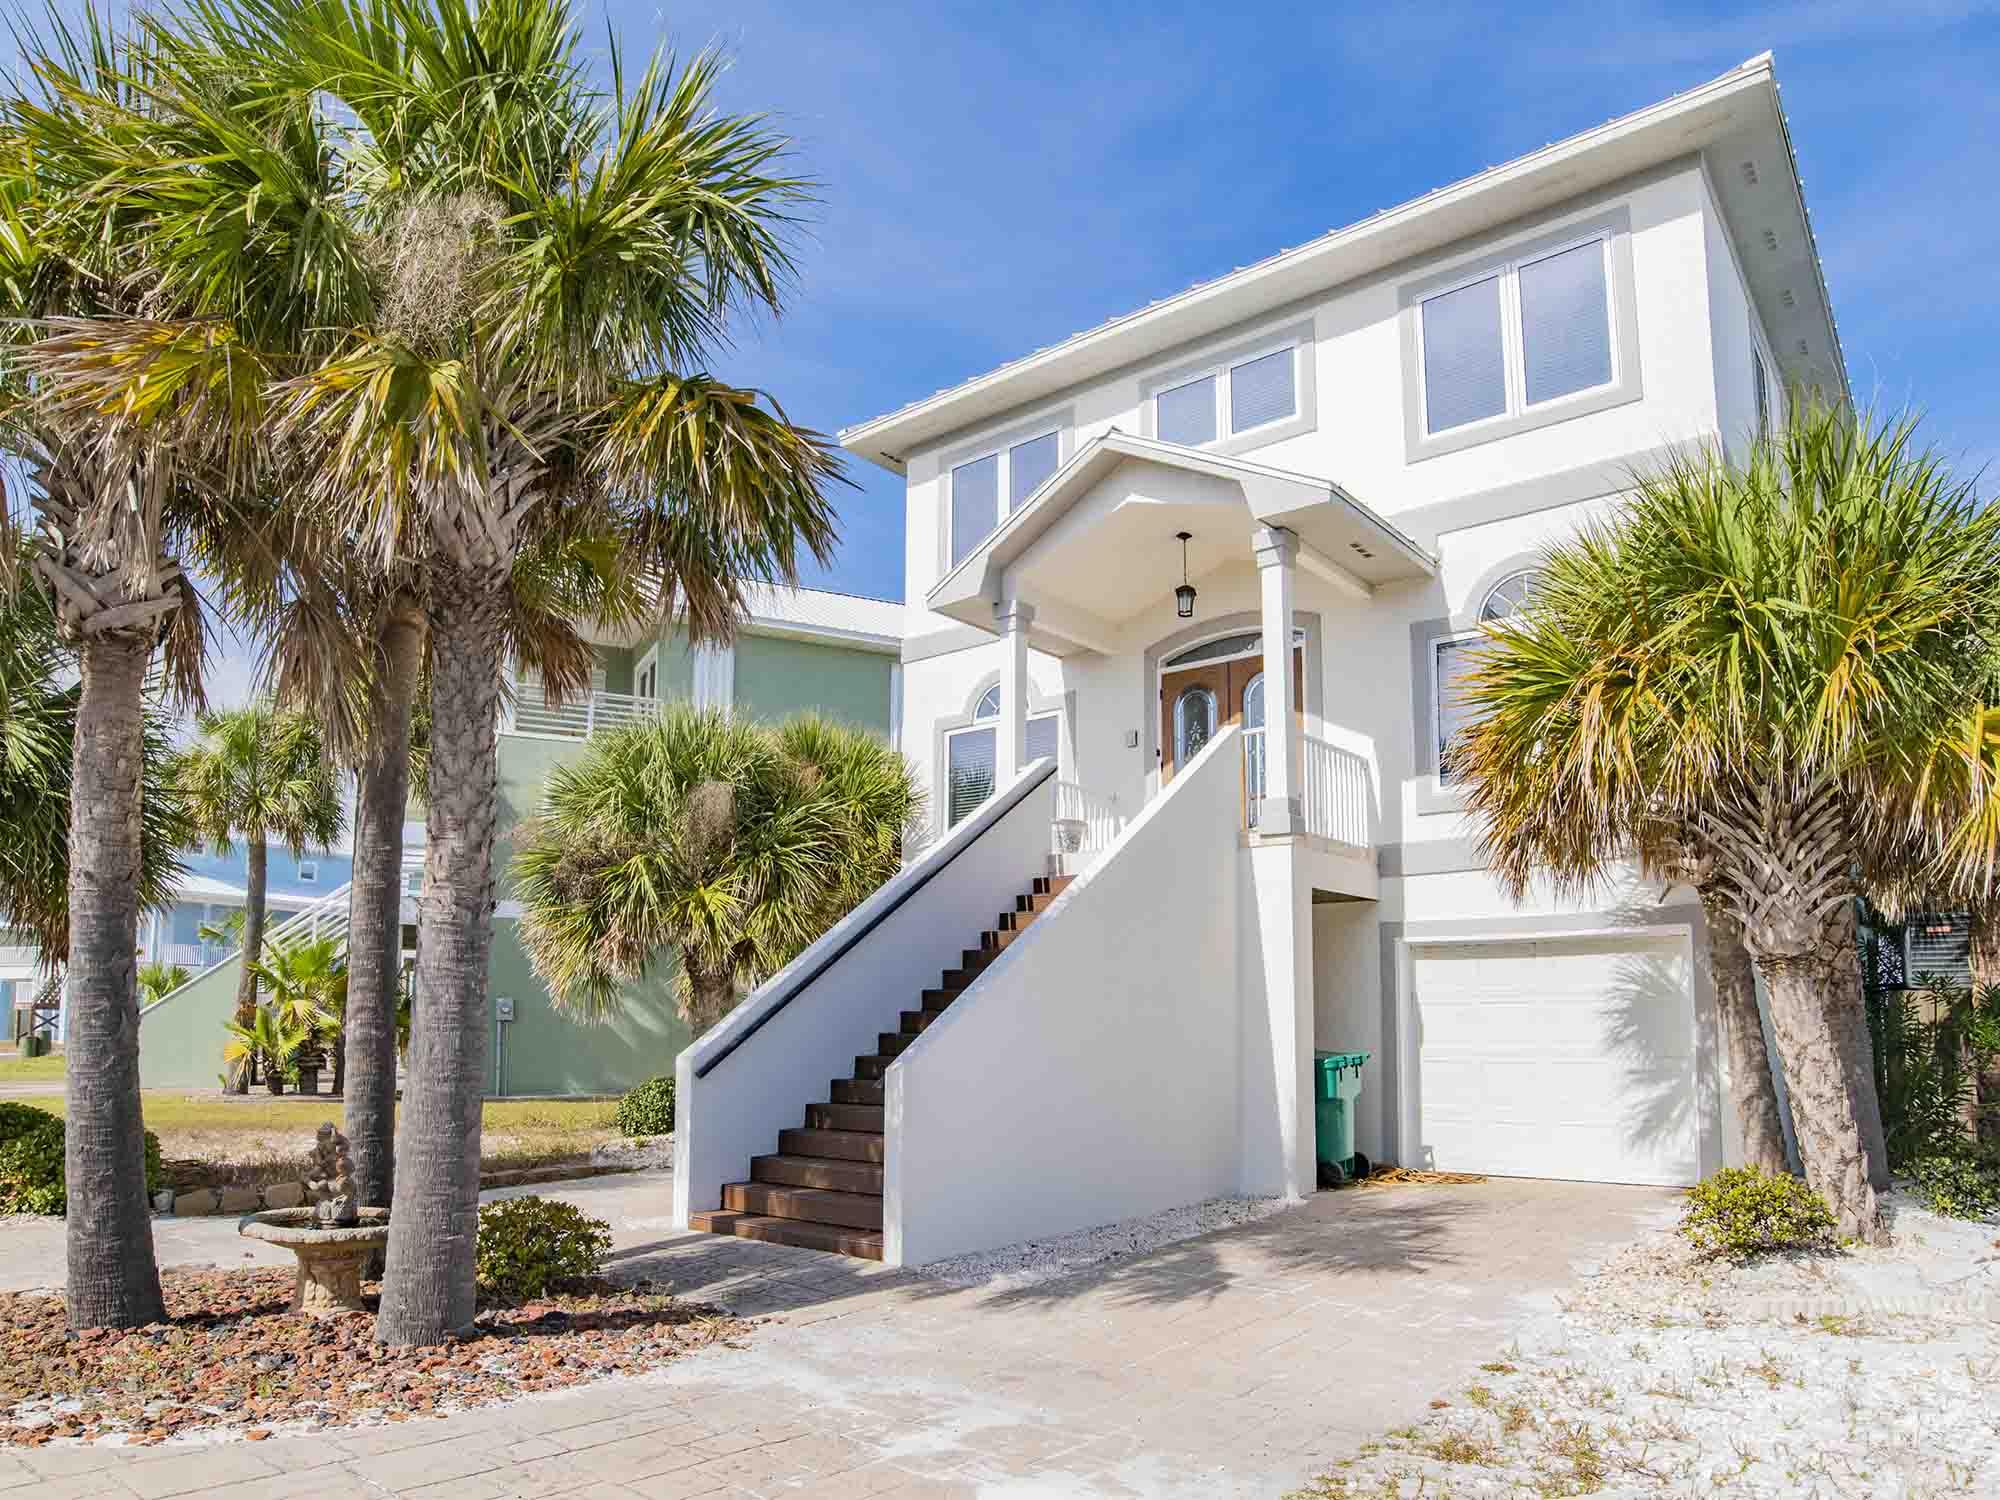 Navarre Beach, Florida Vacation Rental